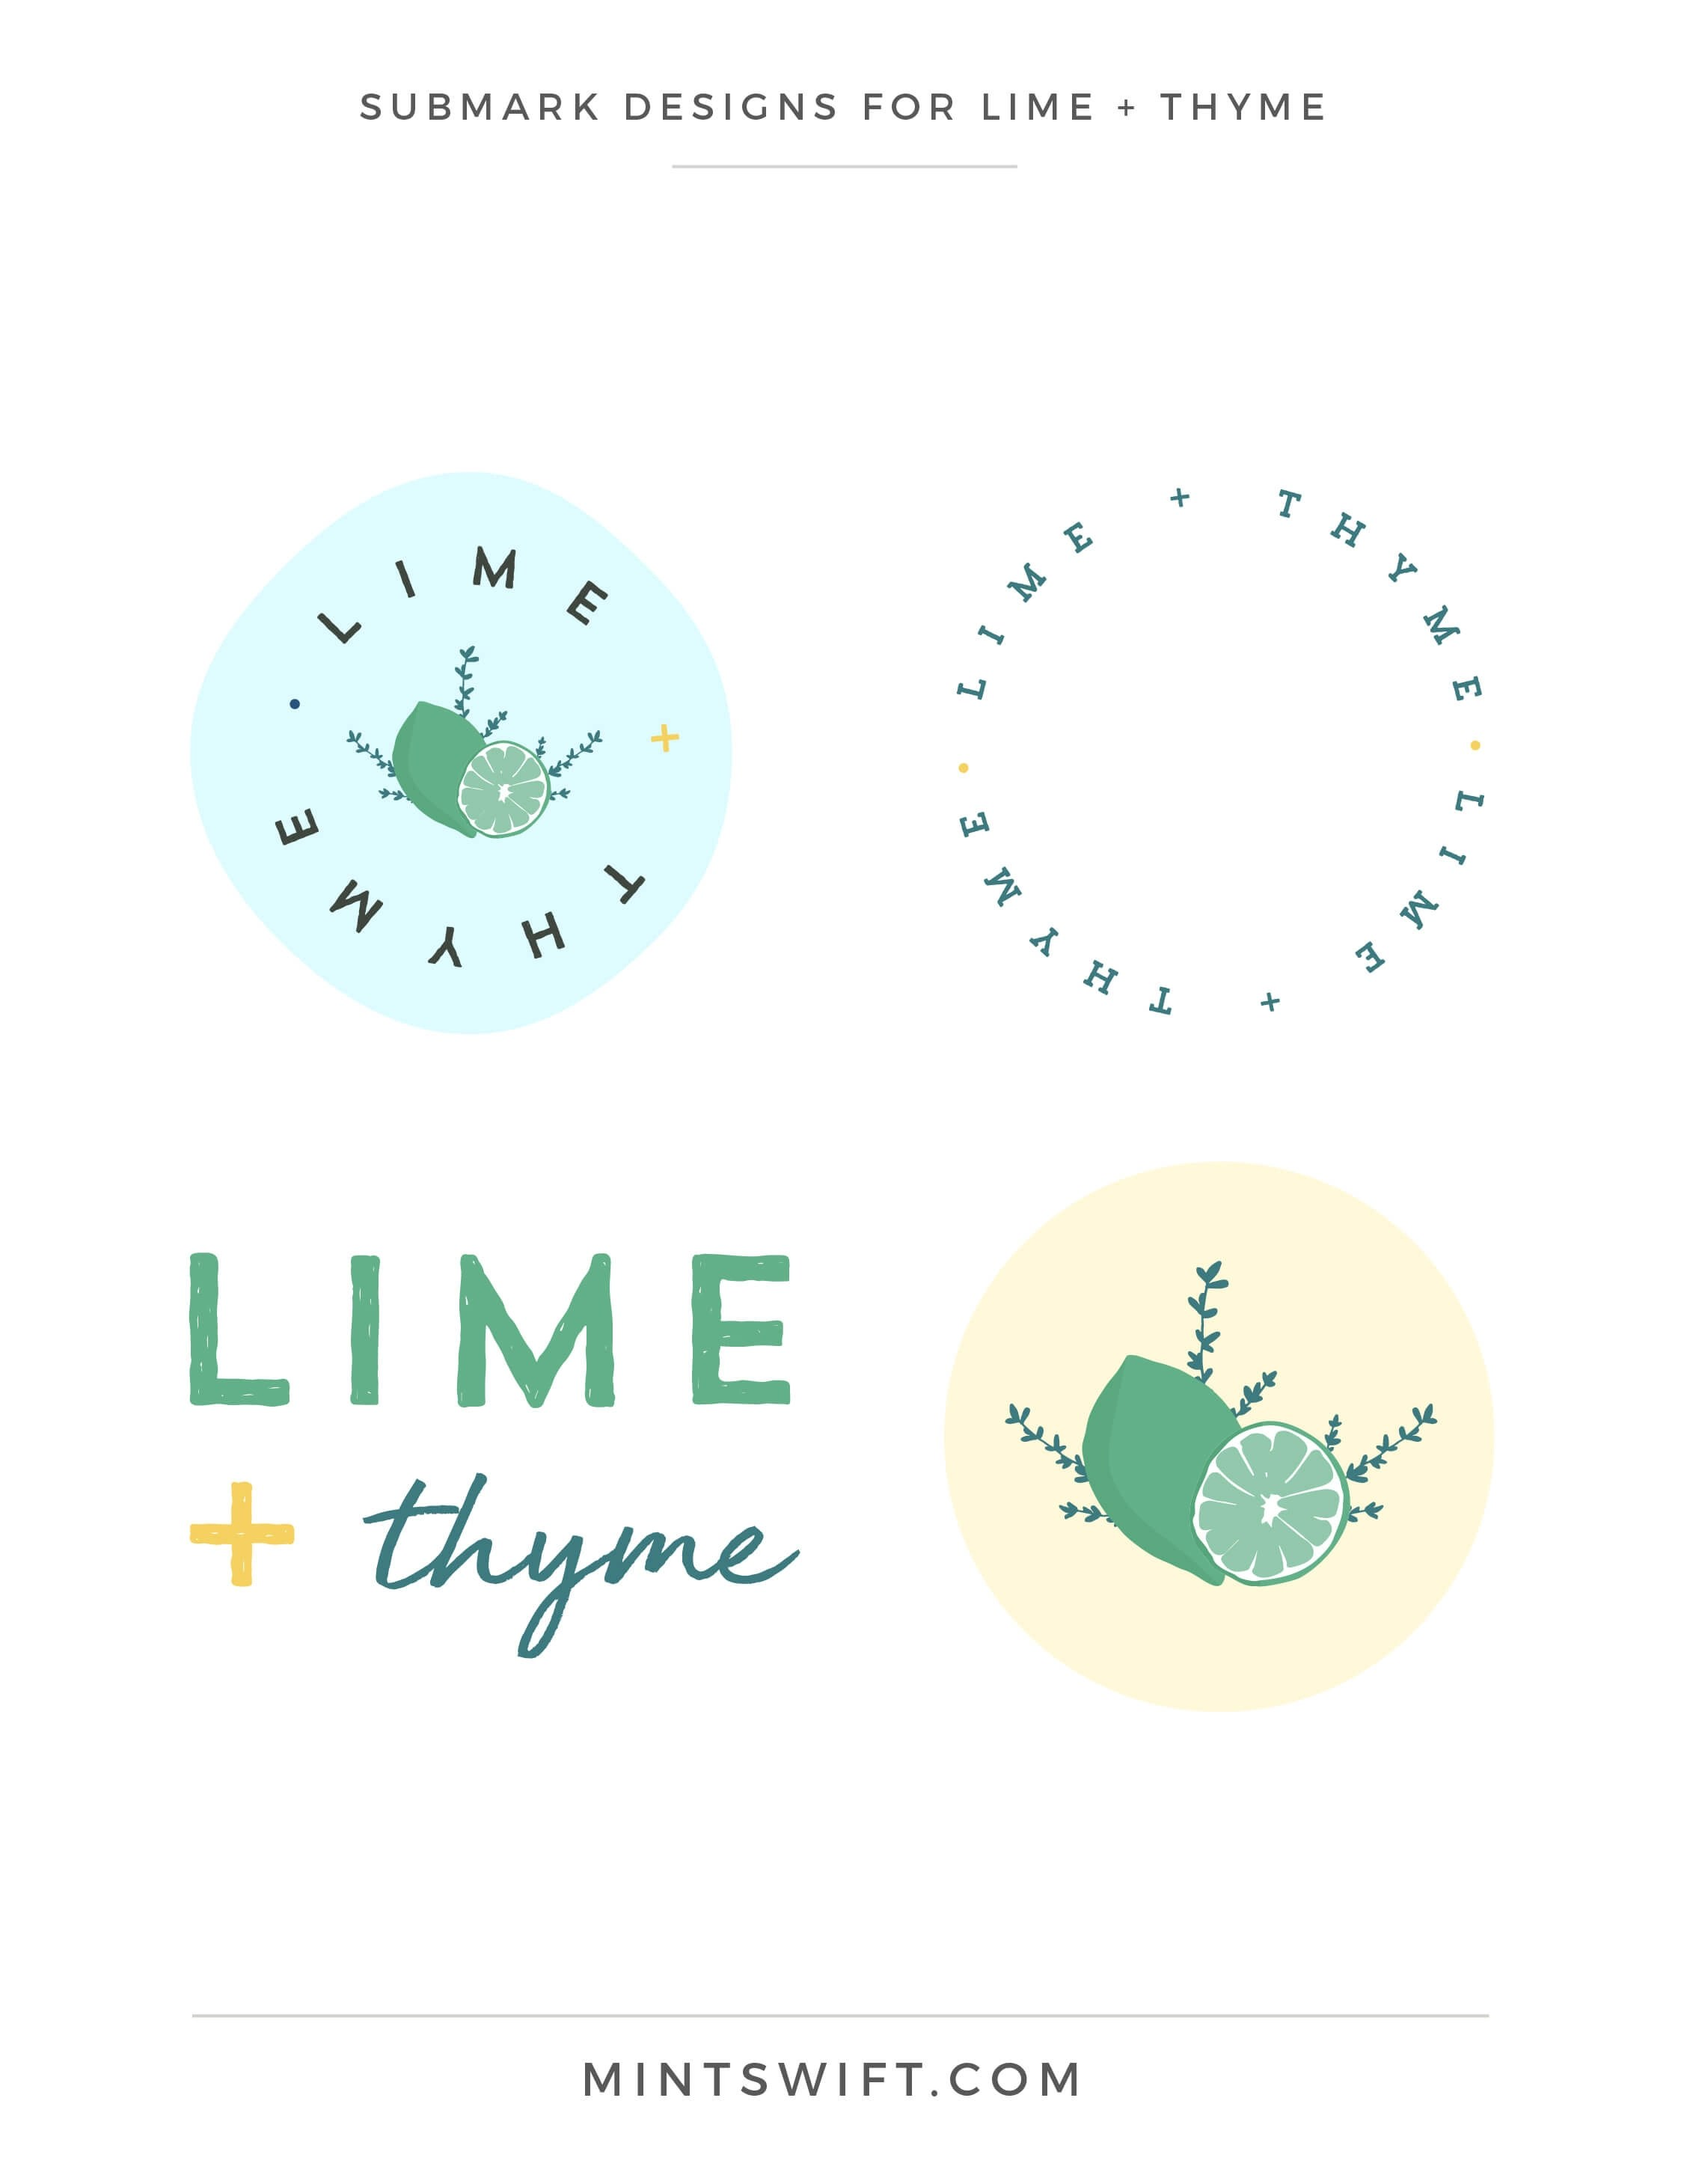 Lime + Thyme - Submark Designs - Brand & Website Design - MintSwift